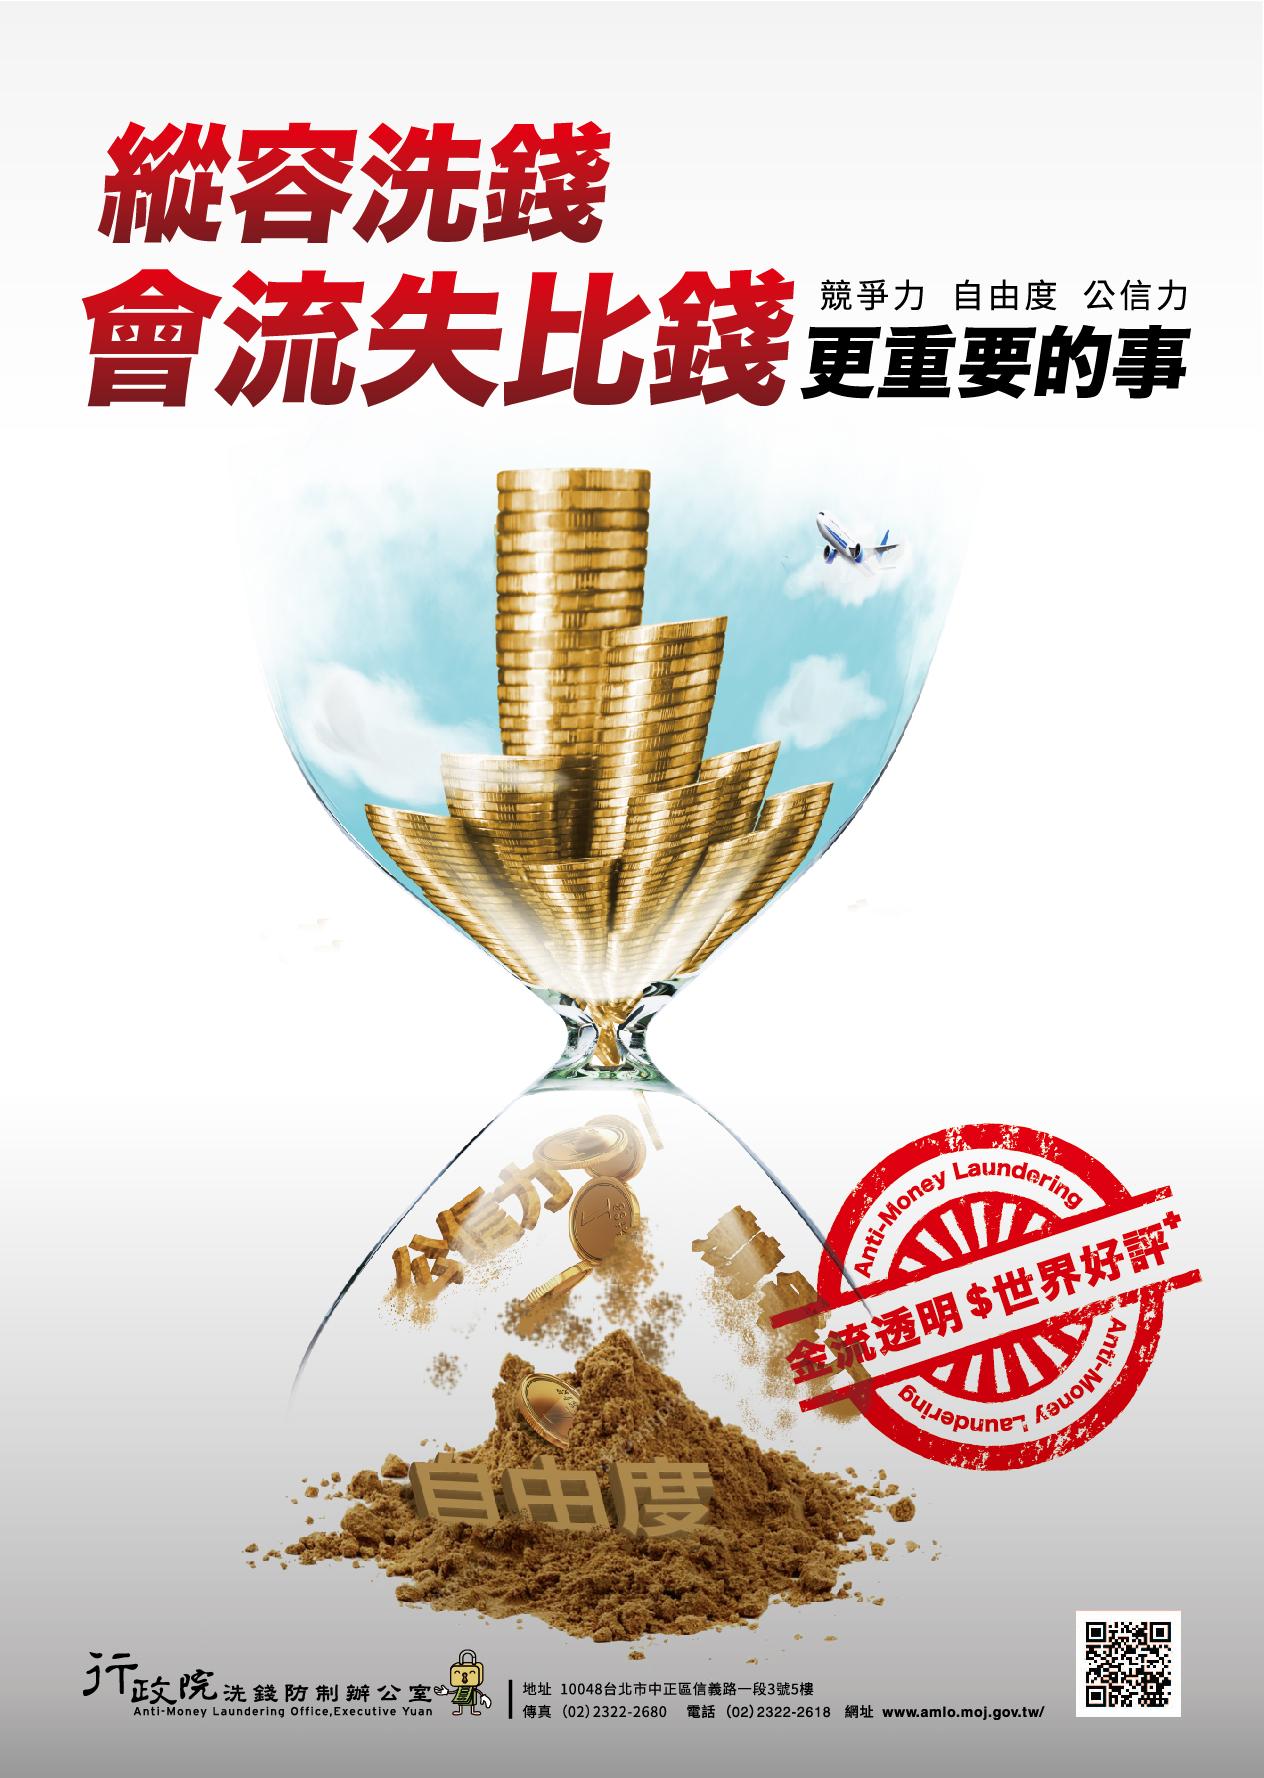 http://www.tpps.cyc.edu.tw/uploads/tadgallery/2017_12_18/4857_縱容洗錢會流失比錢更重要的事.jpg